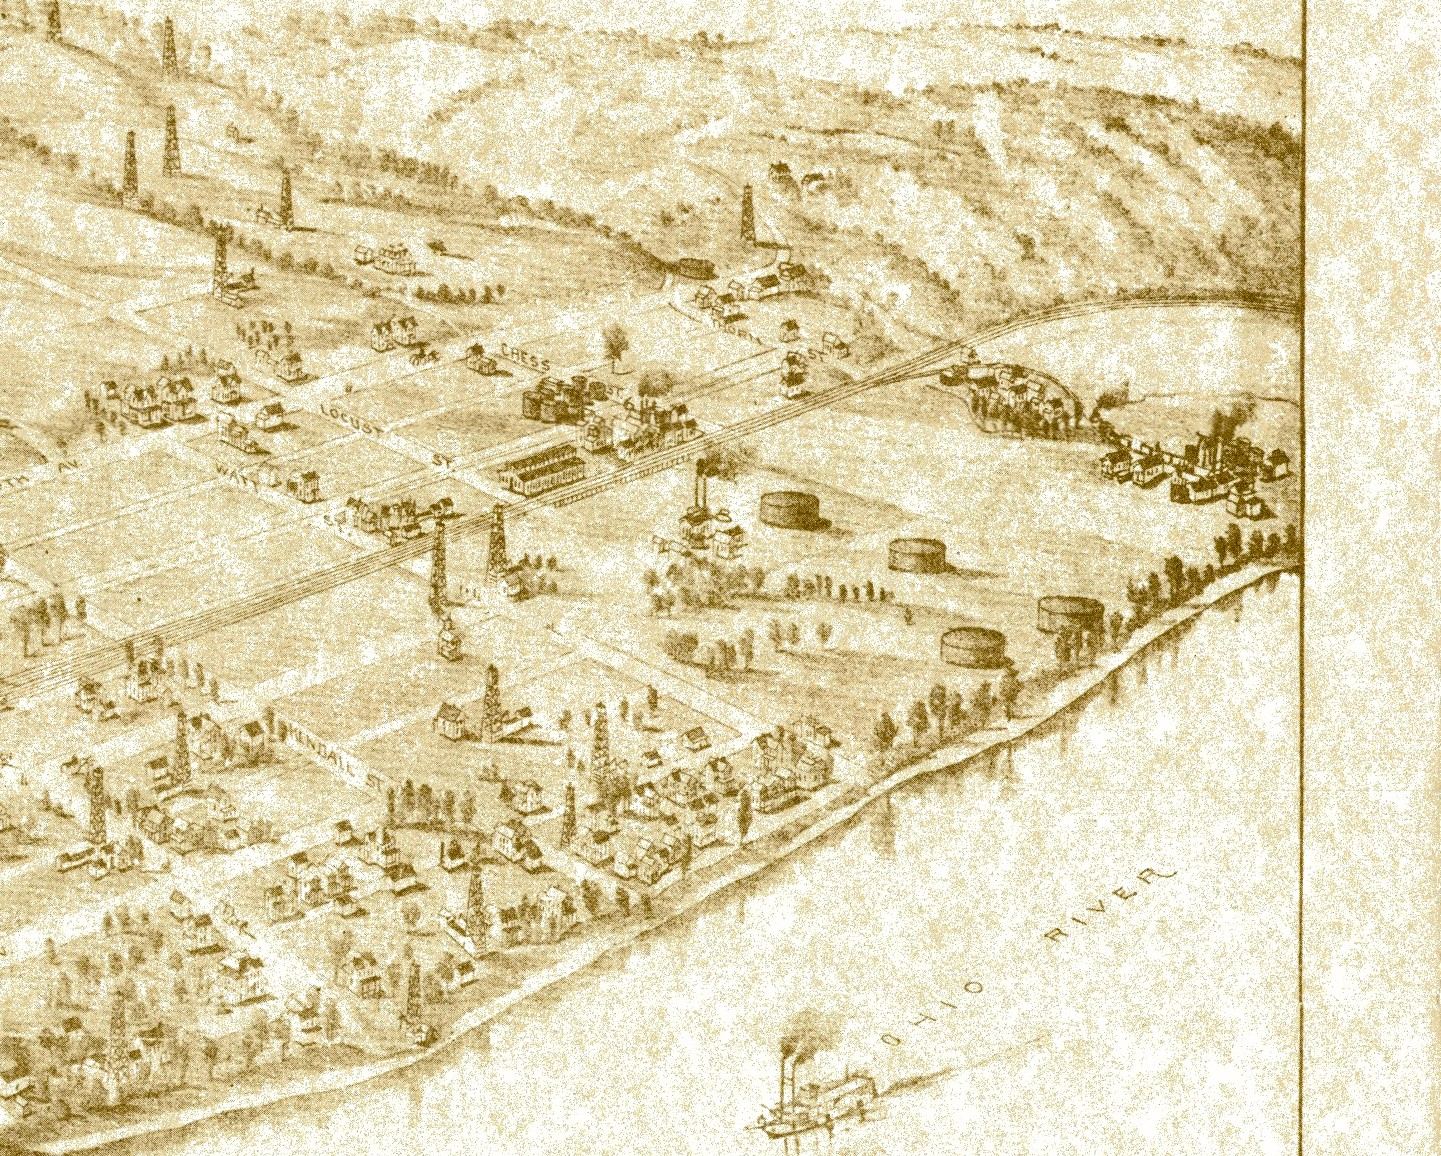 map-75(2C).jpg